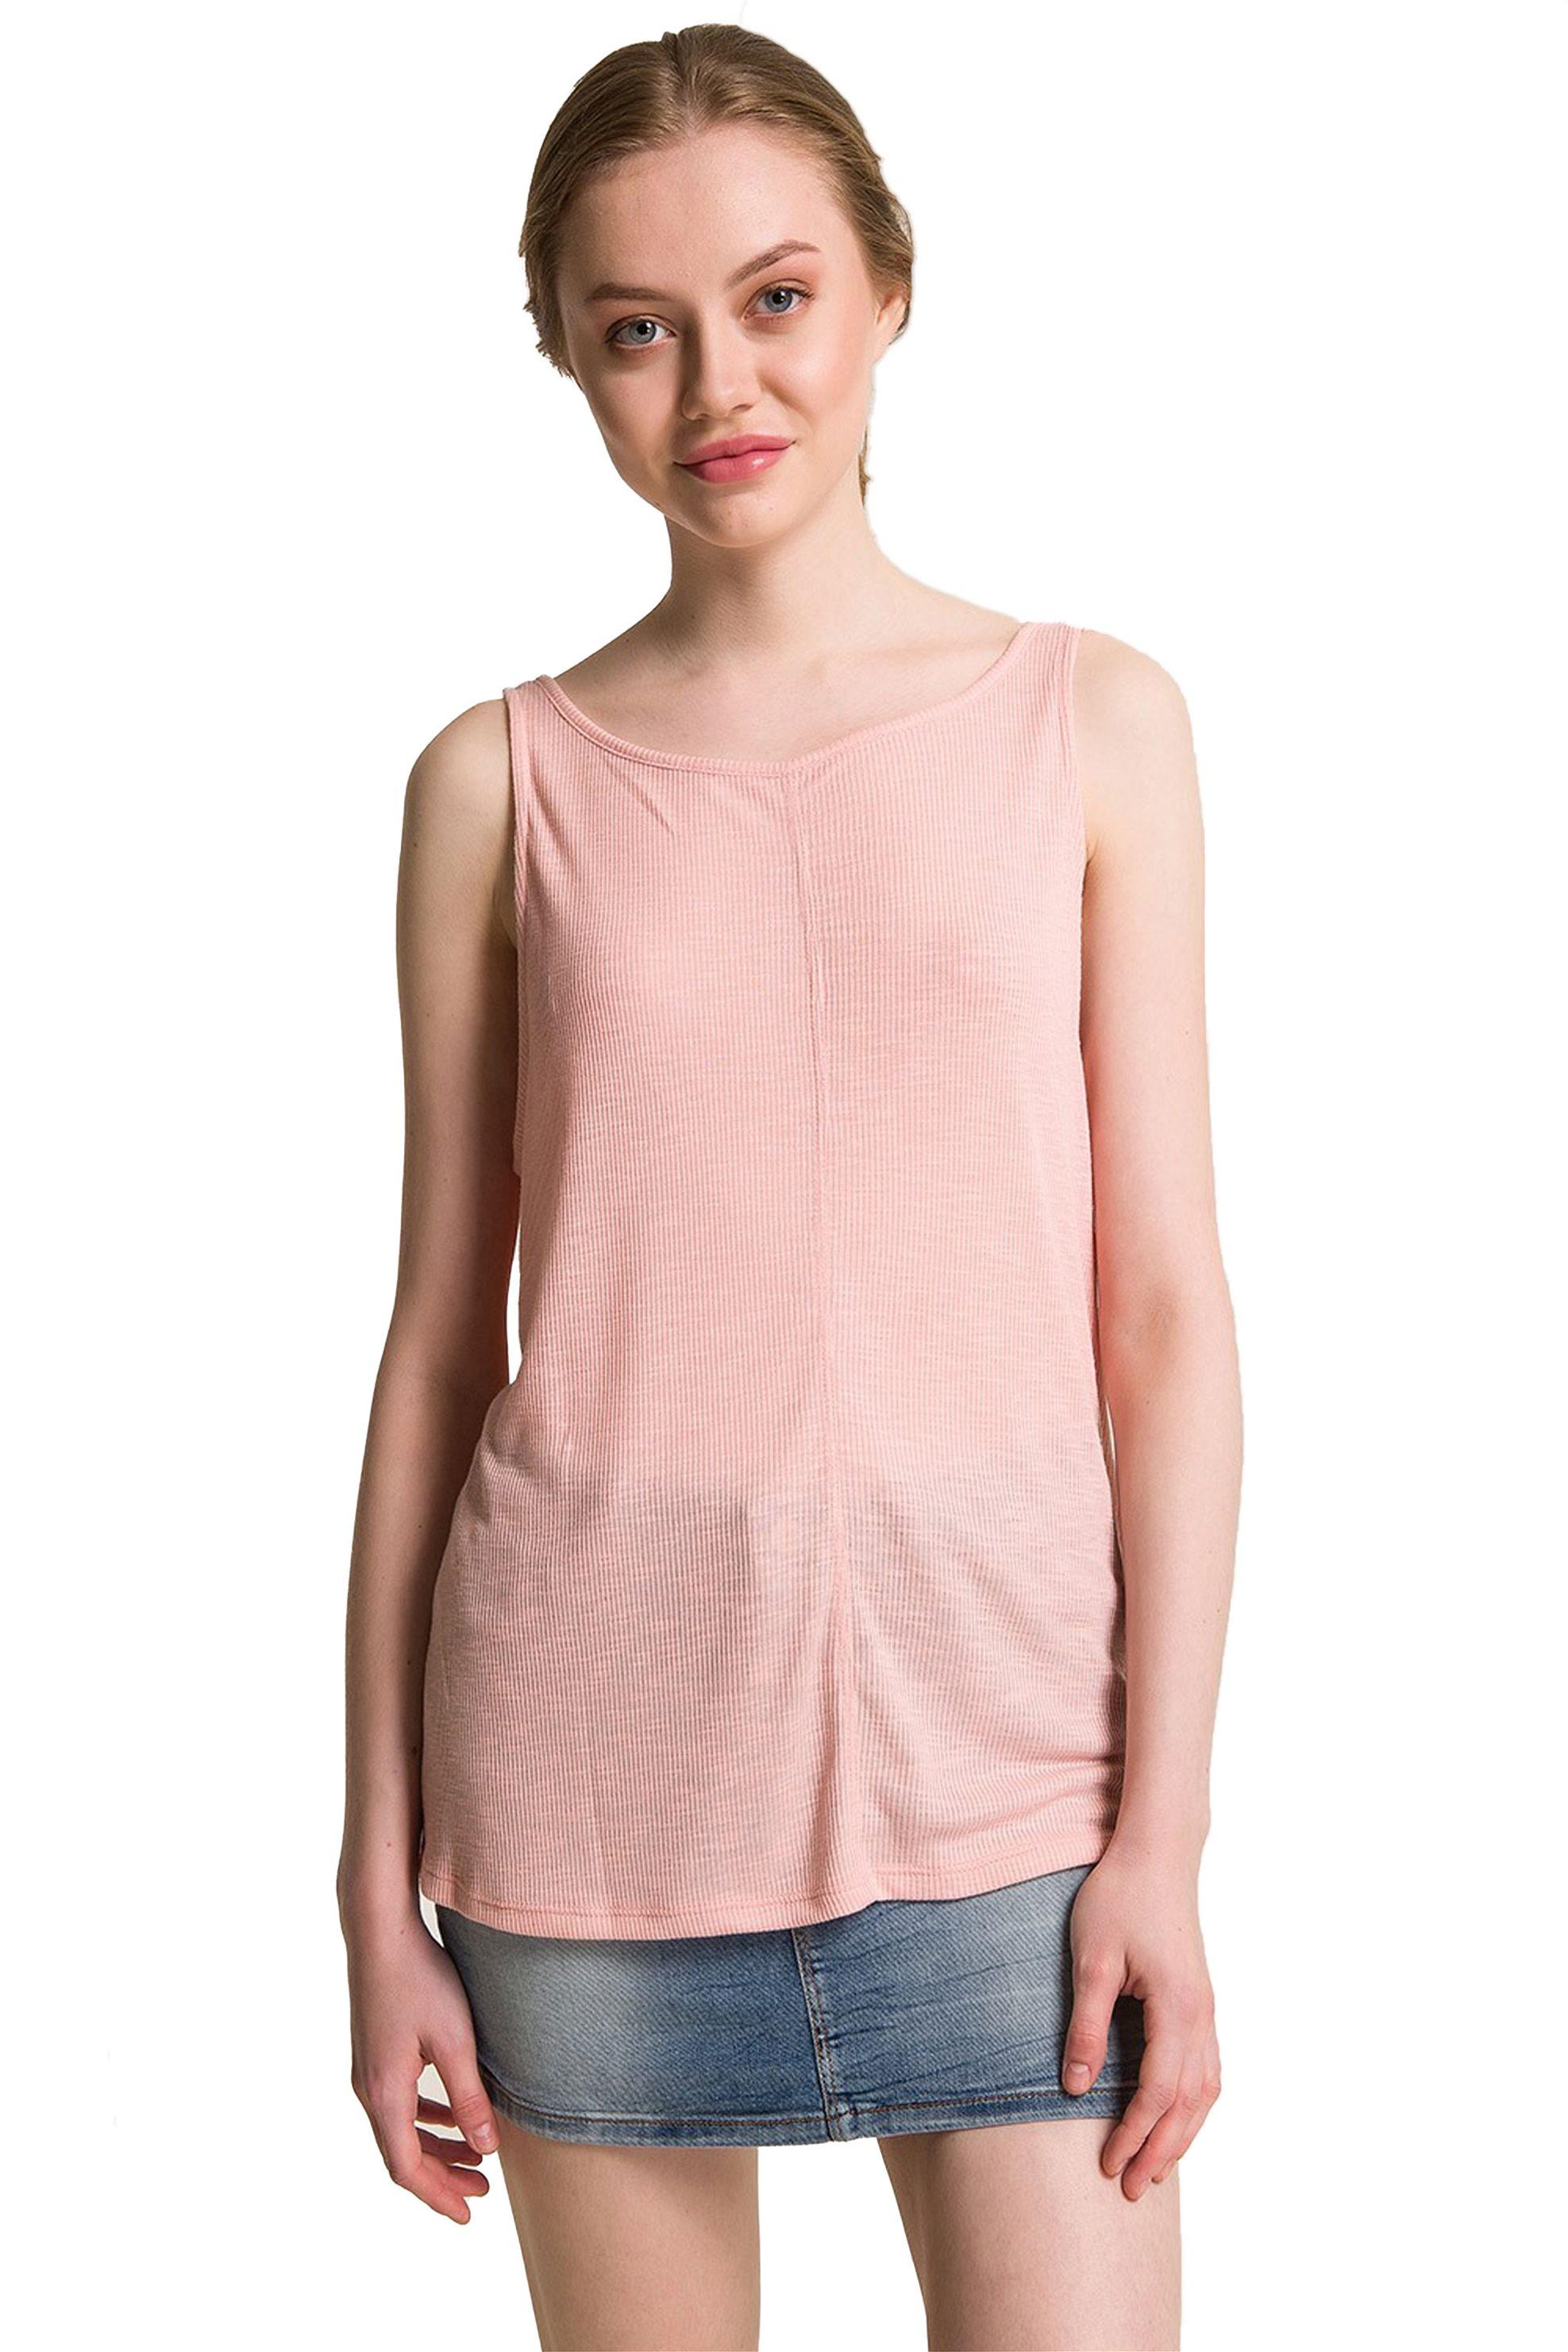 428ae86b5db8 Γυναικεία   Ρούχα   Μπλούζες   All Day   Γυναικεία μπλούζα με πλάτη ...